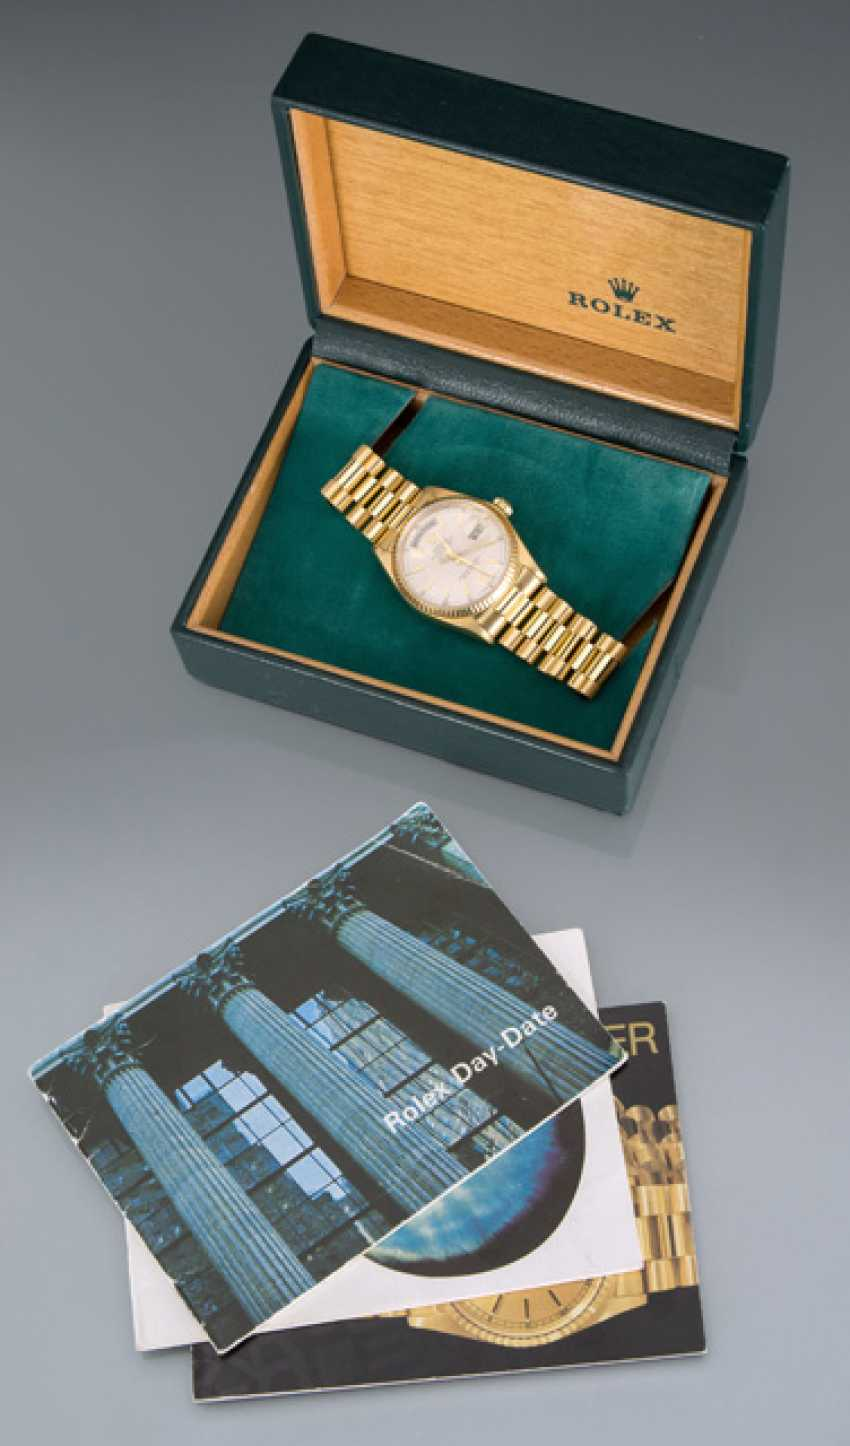 Rolex Day Date, Ref. 18038 - photo 2